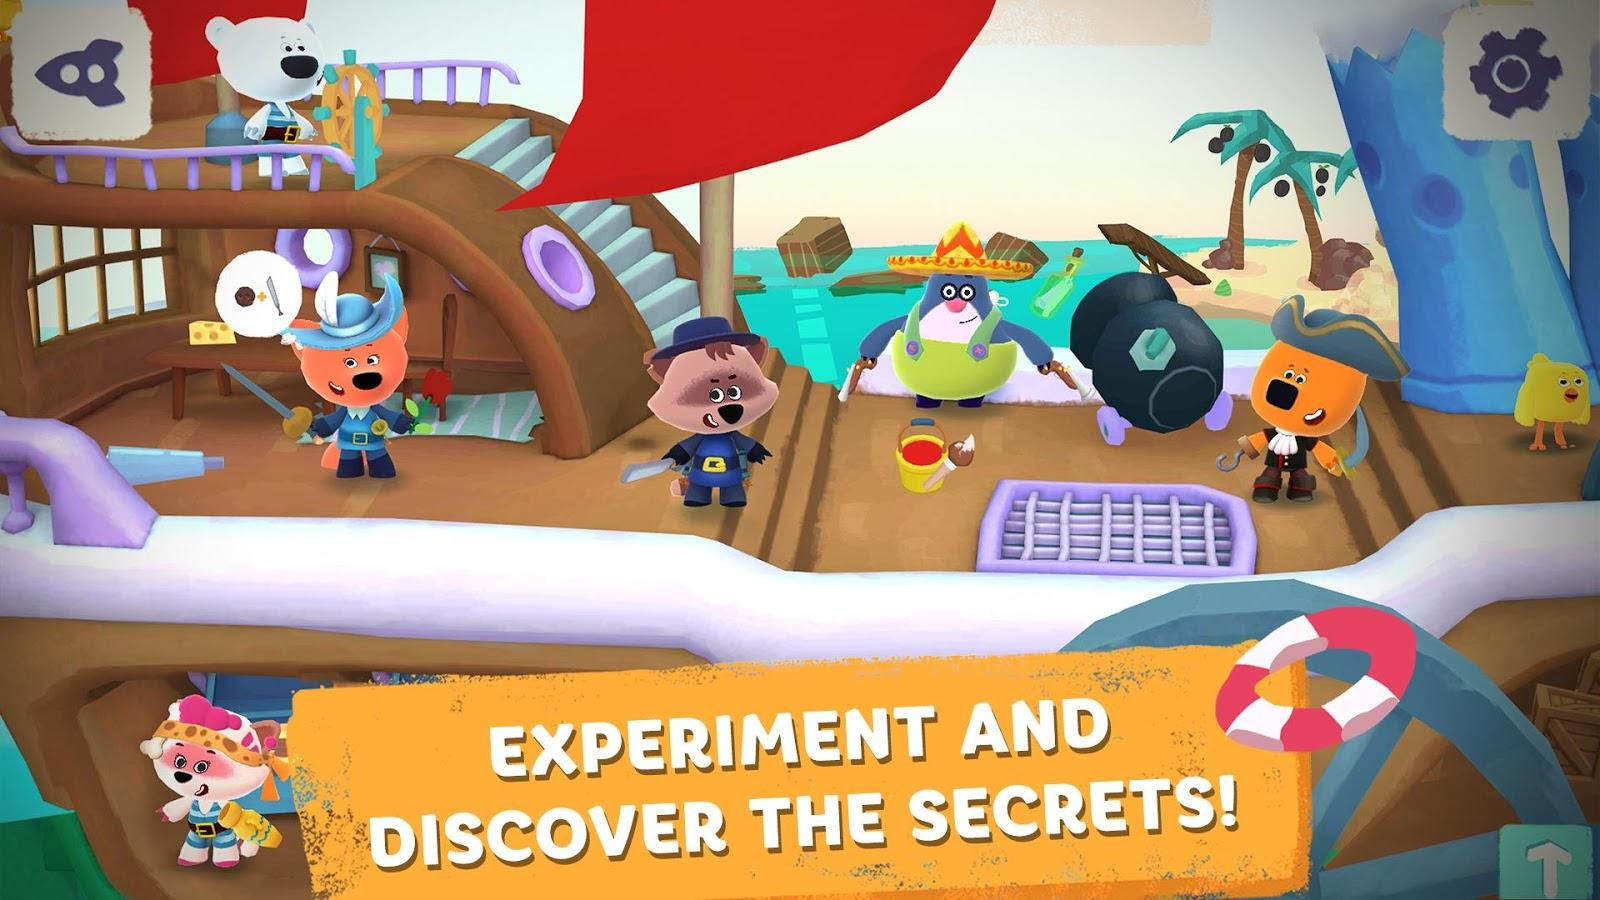 Скачать Angry Birds Space на Android бесплатно